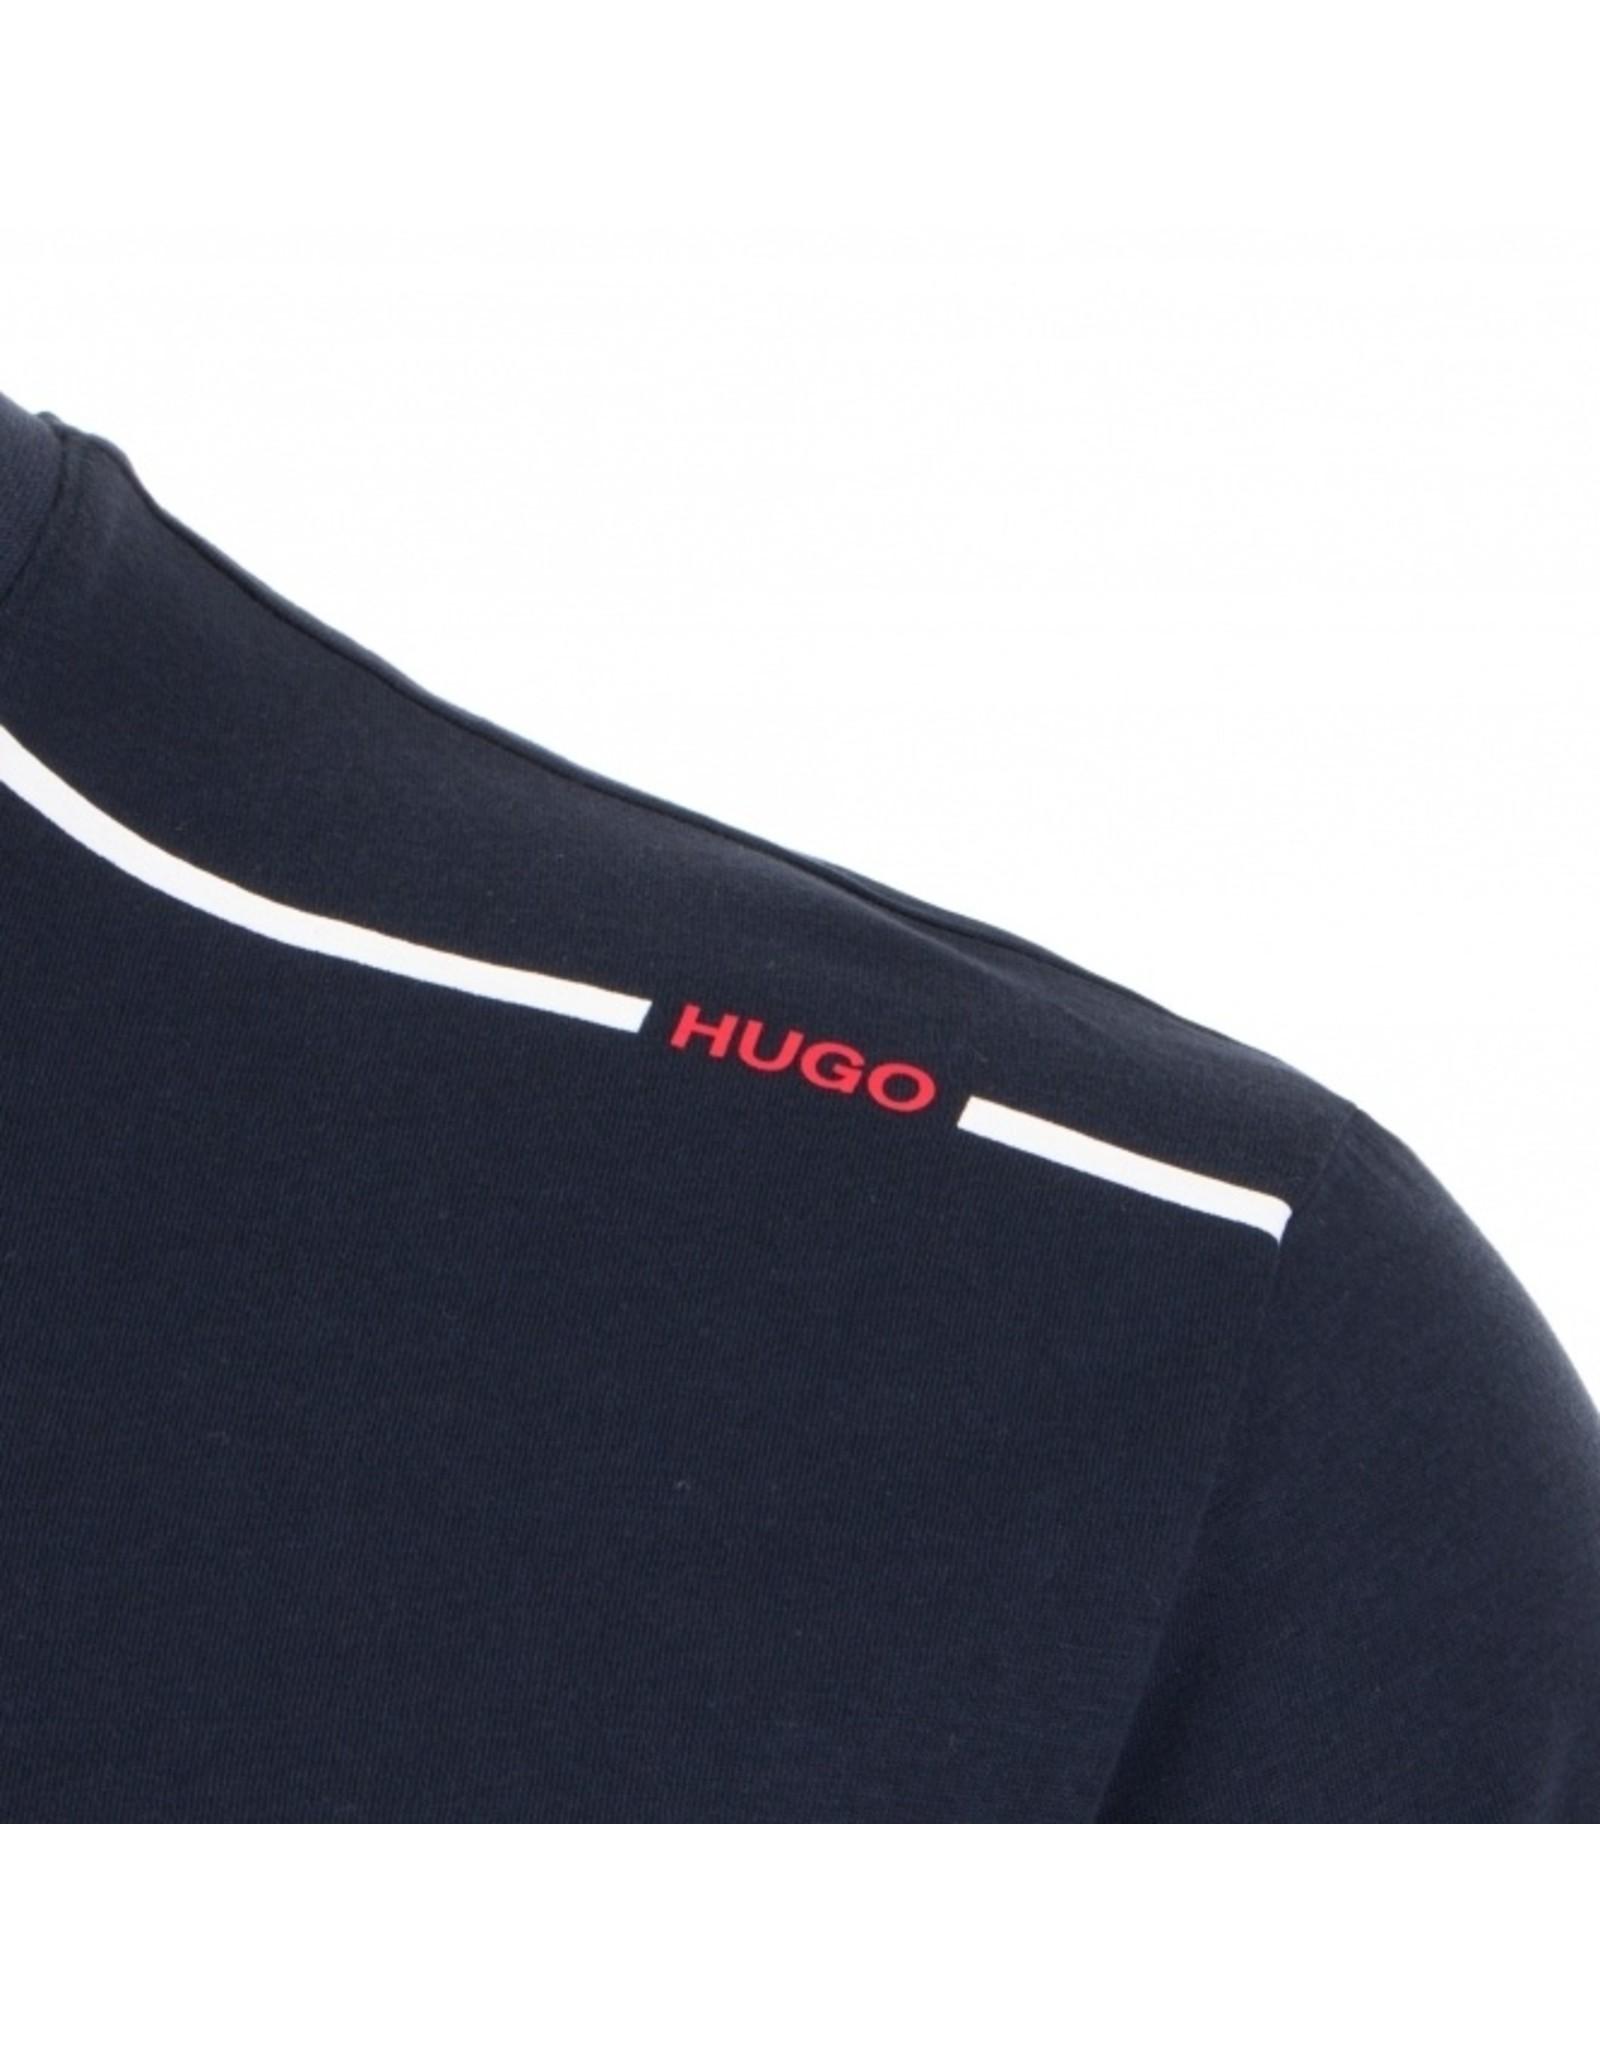 HUGO HUGO DYRTID SS20